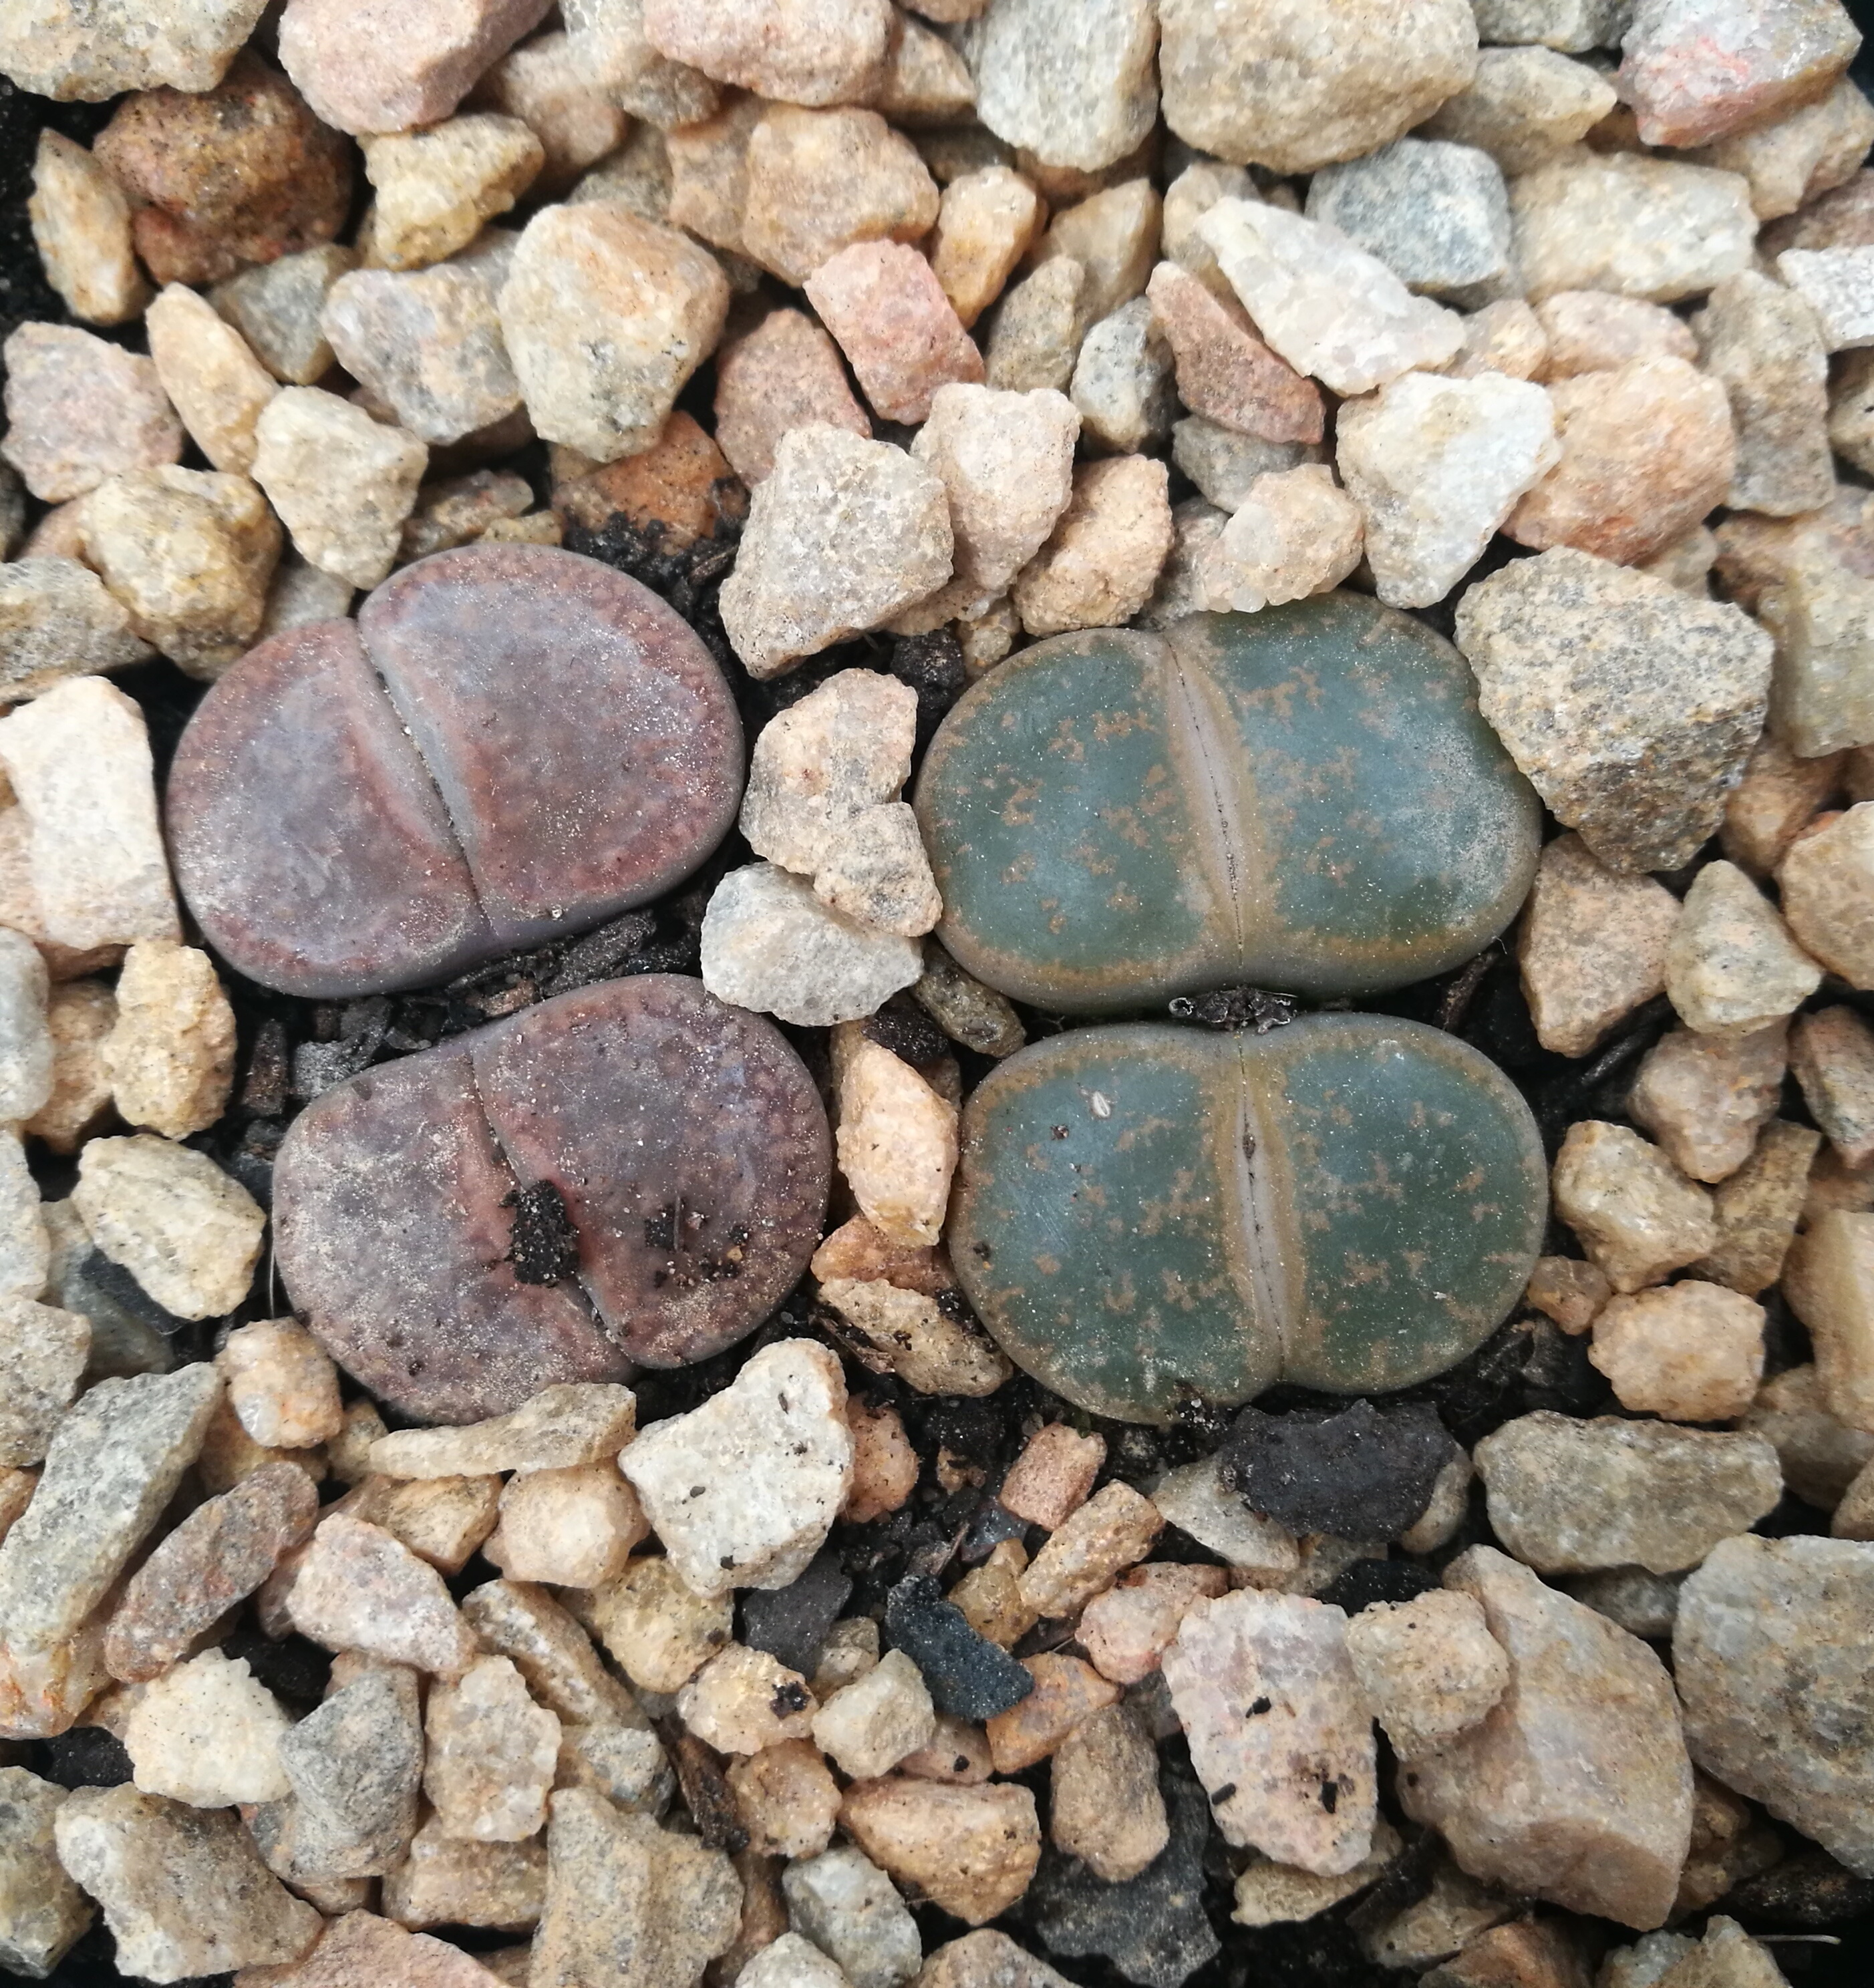 lithops succulent series lifestyle blog garden plant shop nursery gauteng johannesburg